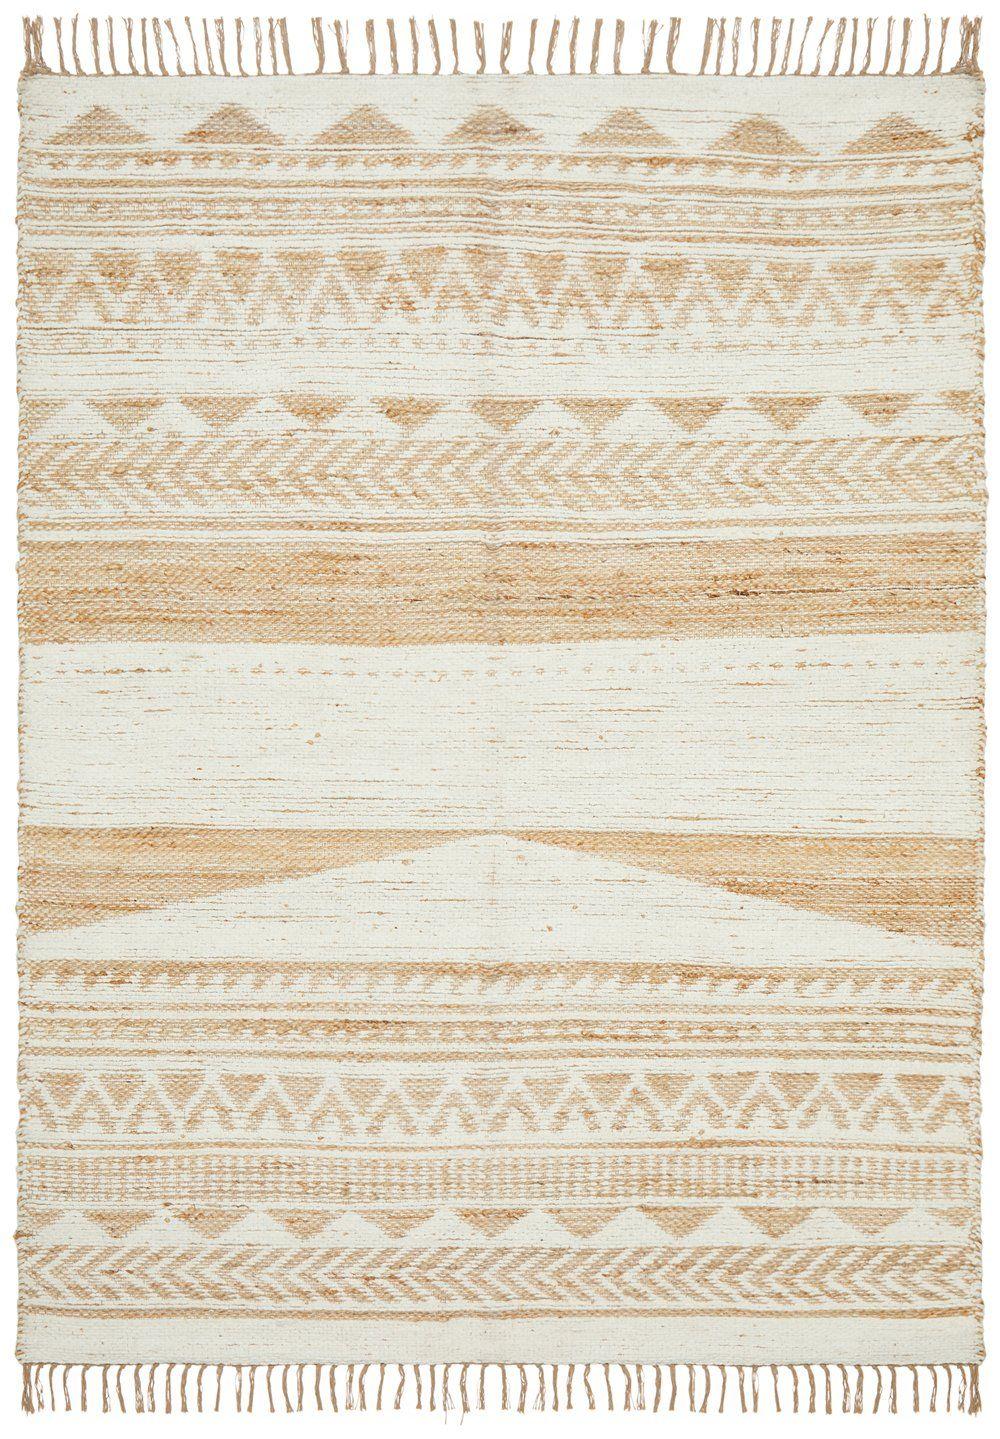 Natural Jute Blend Tribal Print Rug